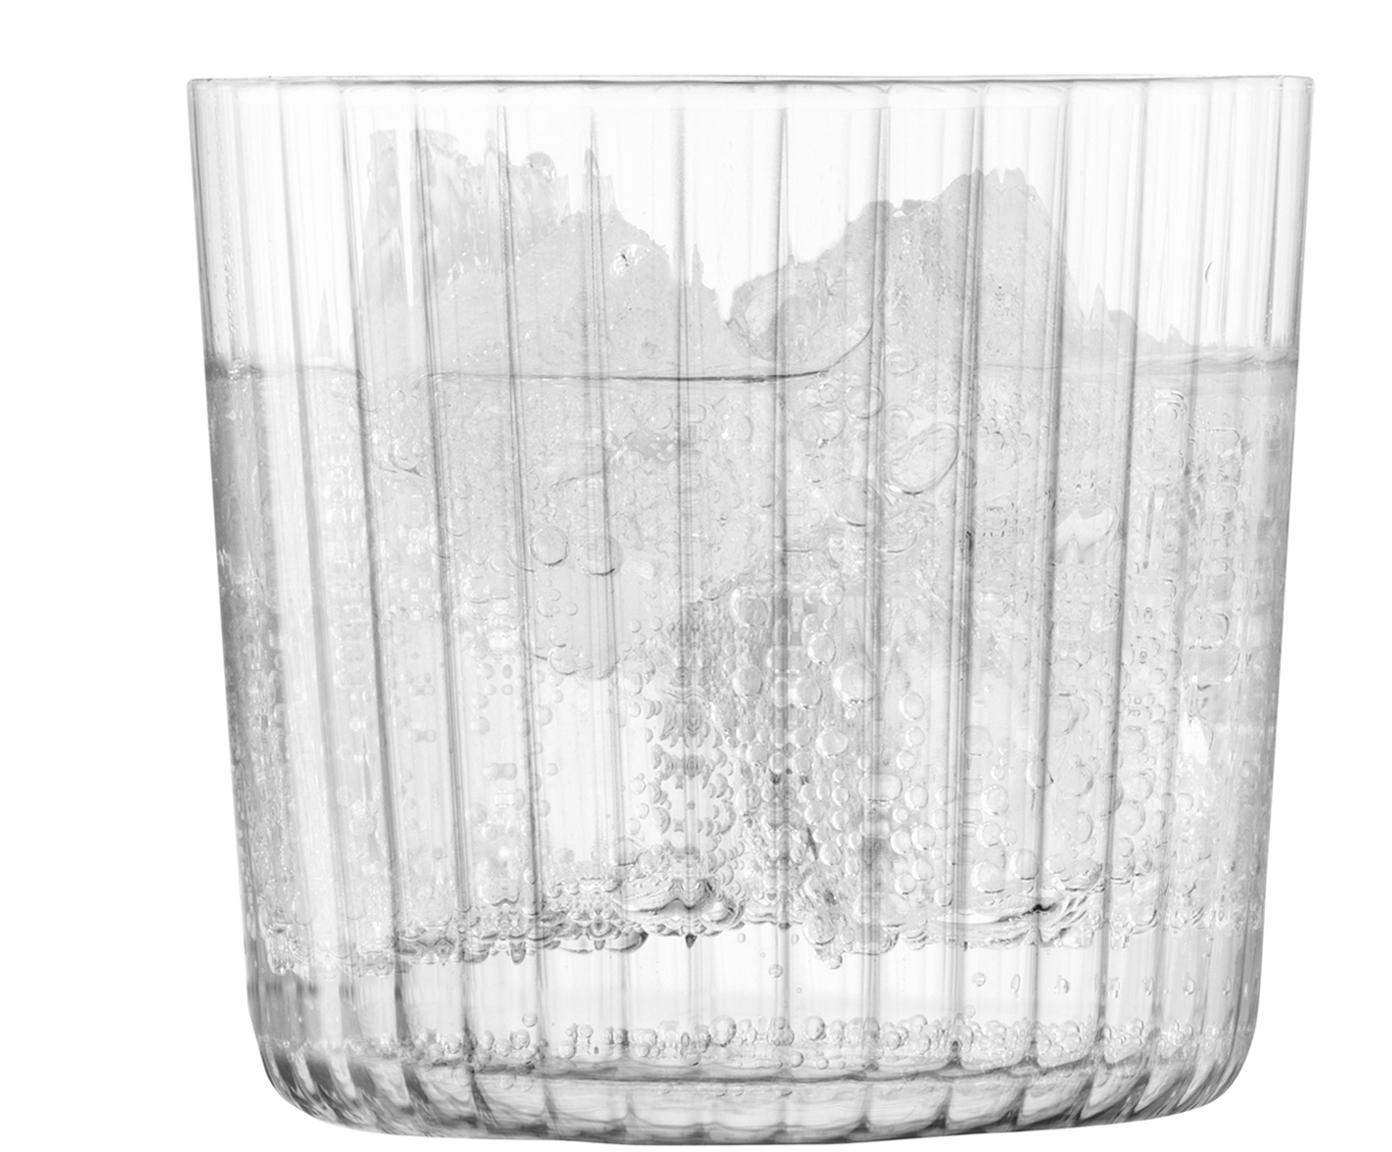 Mondgeblazen waterglazen Gio met groefstructuur, 4-delig, Glas, Transparant, Ø 8 x H 7 cm